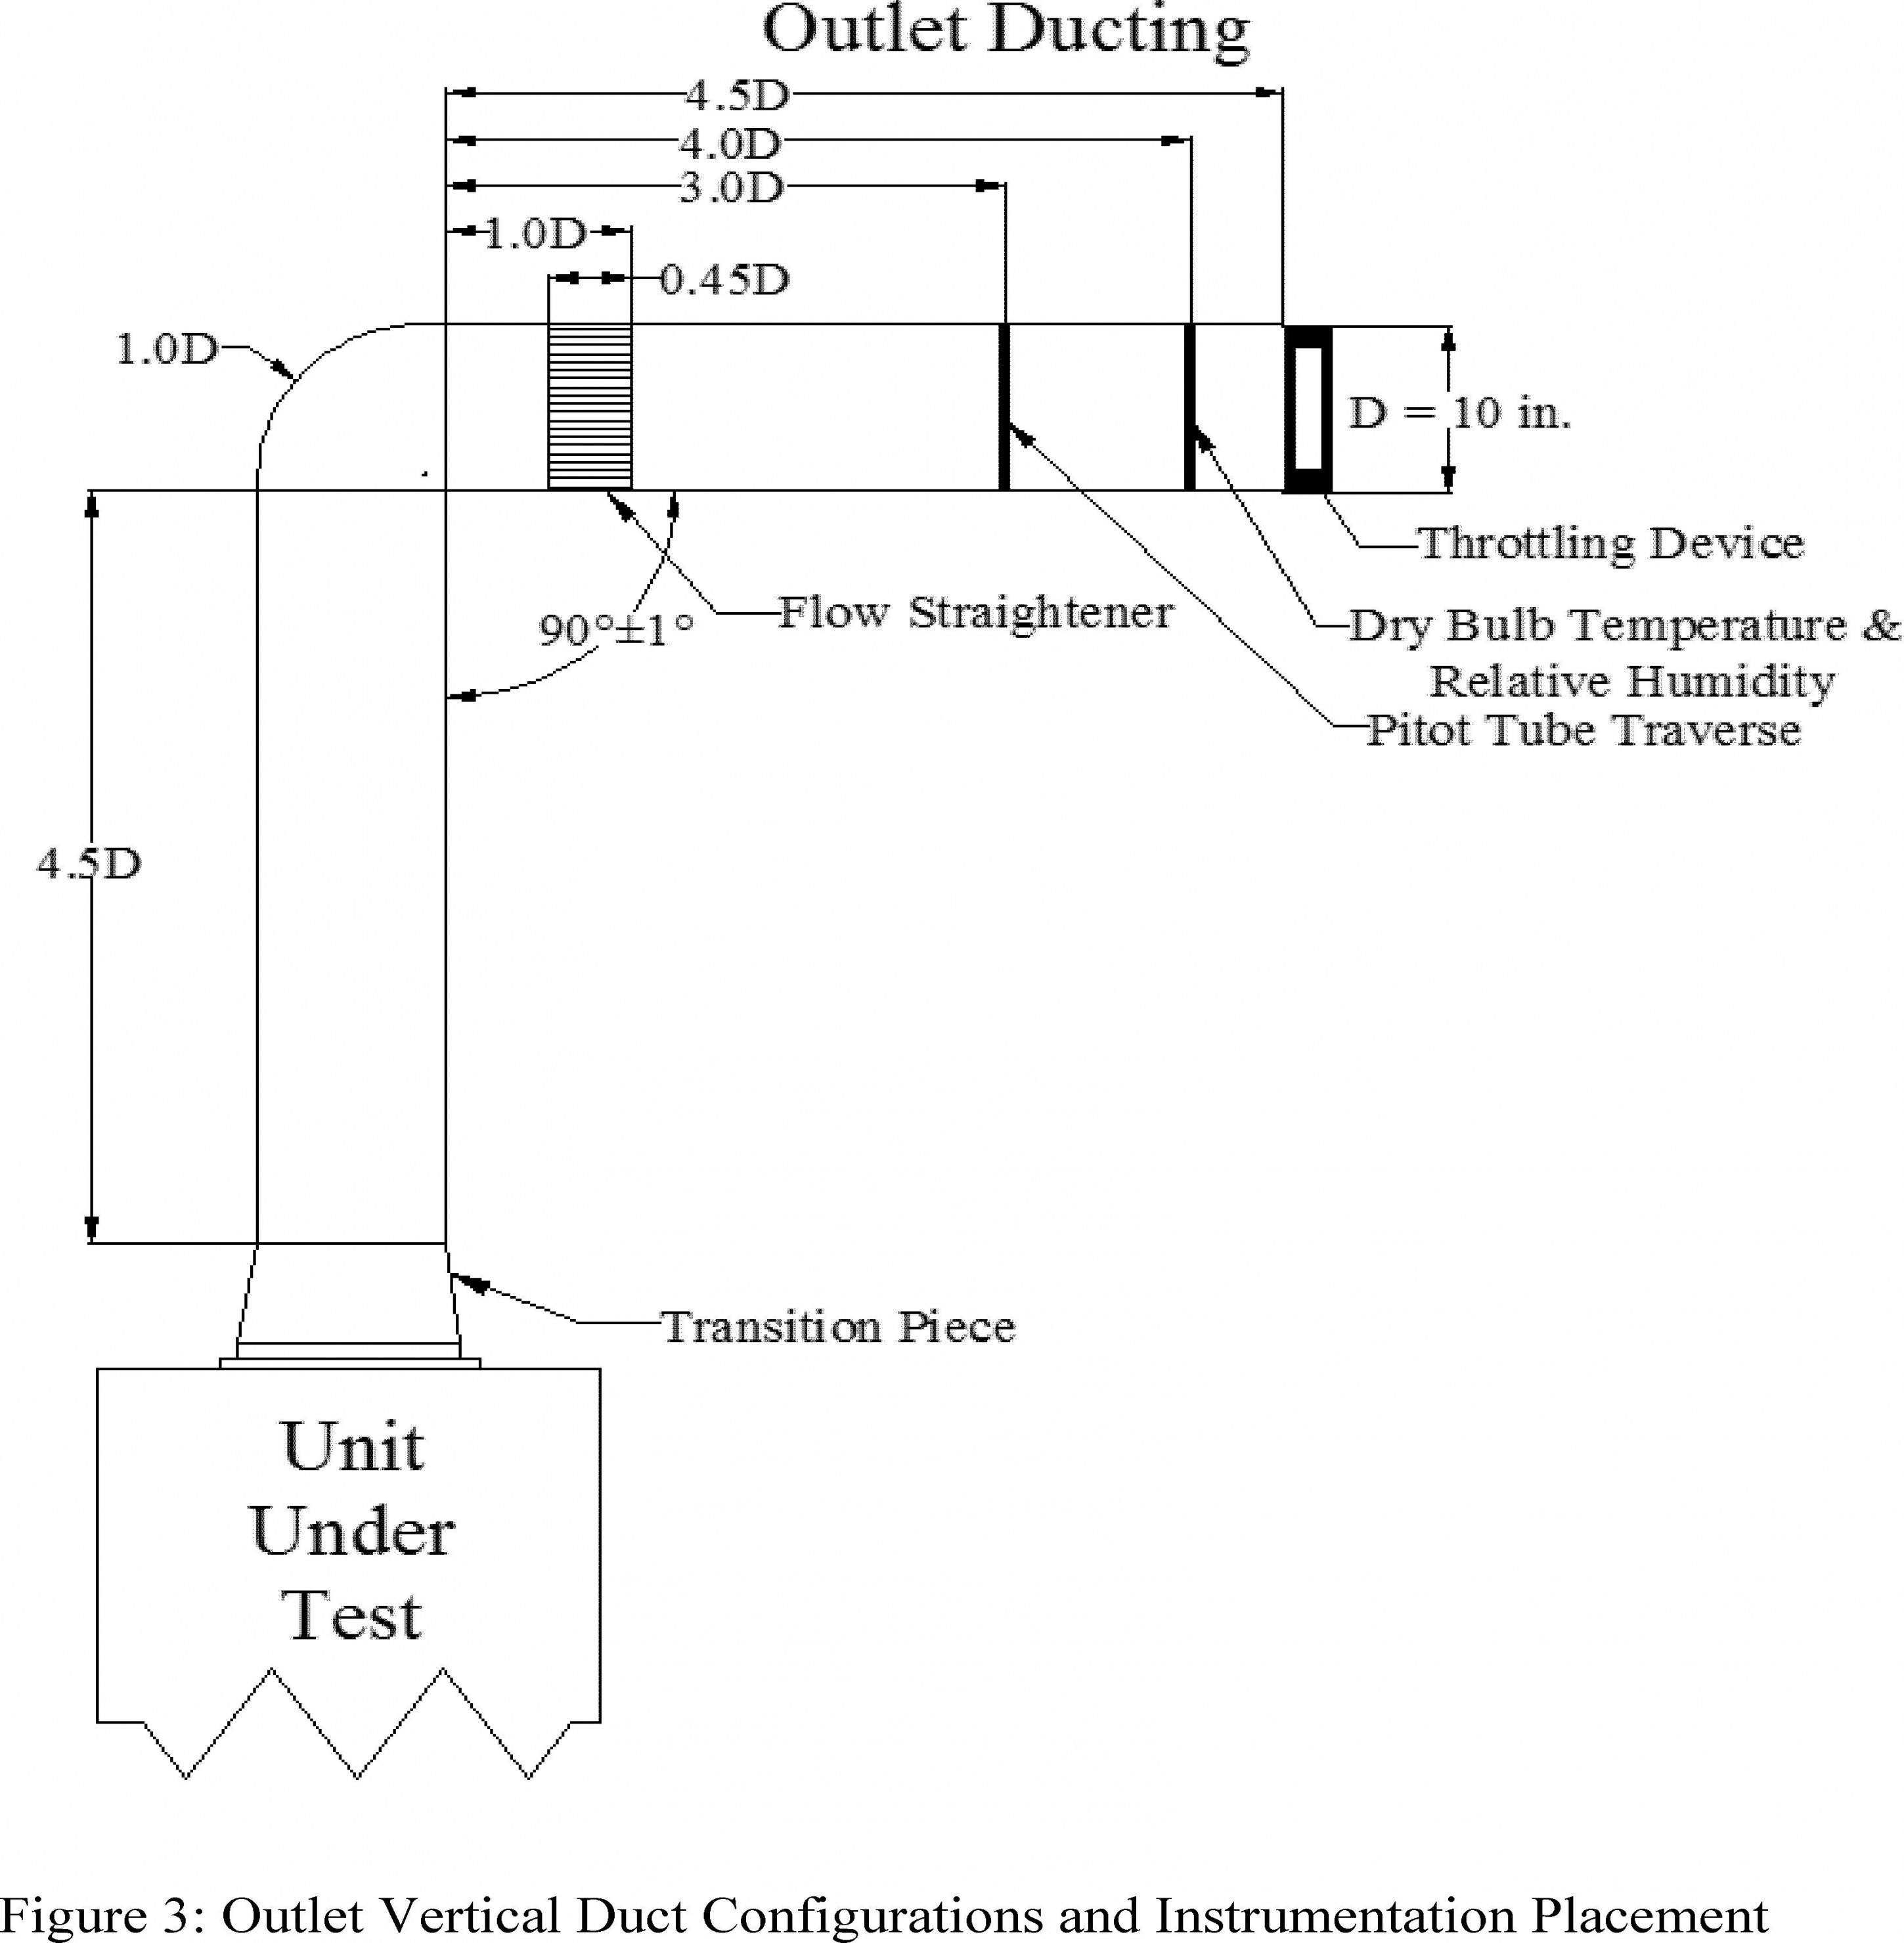 Ford Car Part Diagrams 2a51ed0 2003 ford Taurus Stereo Wiring Diagram Of Ford Car Part Diagrams